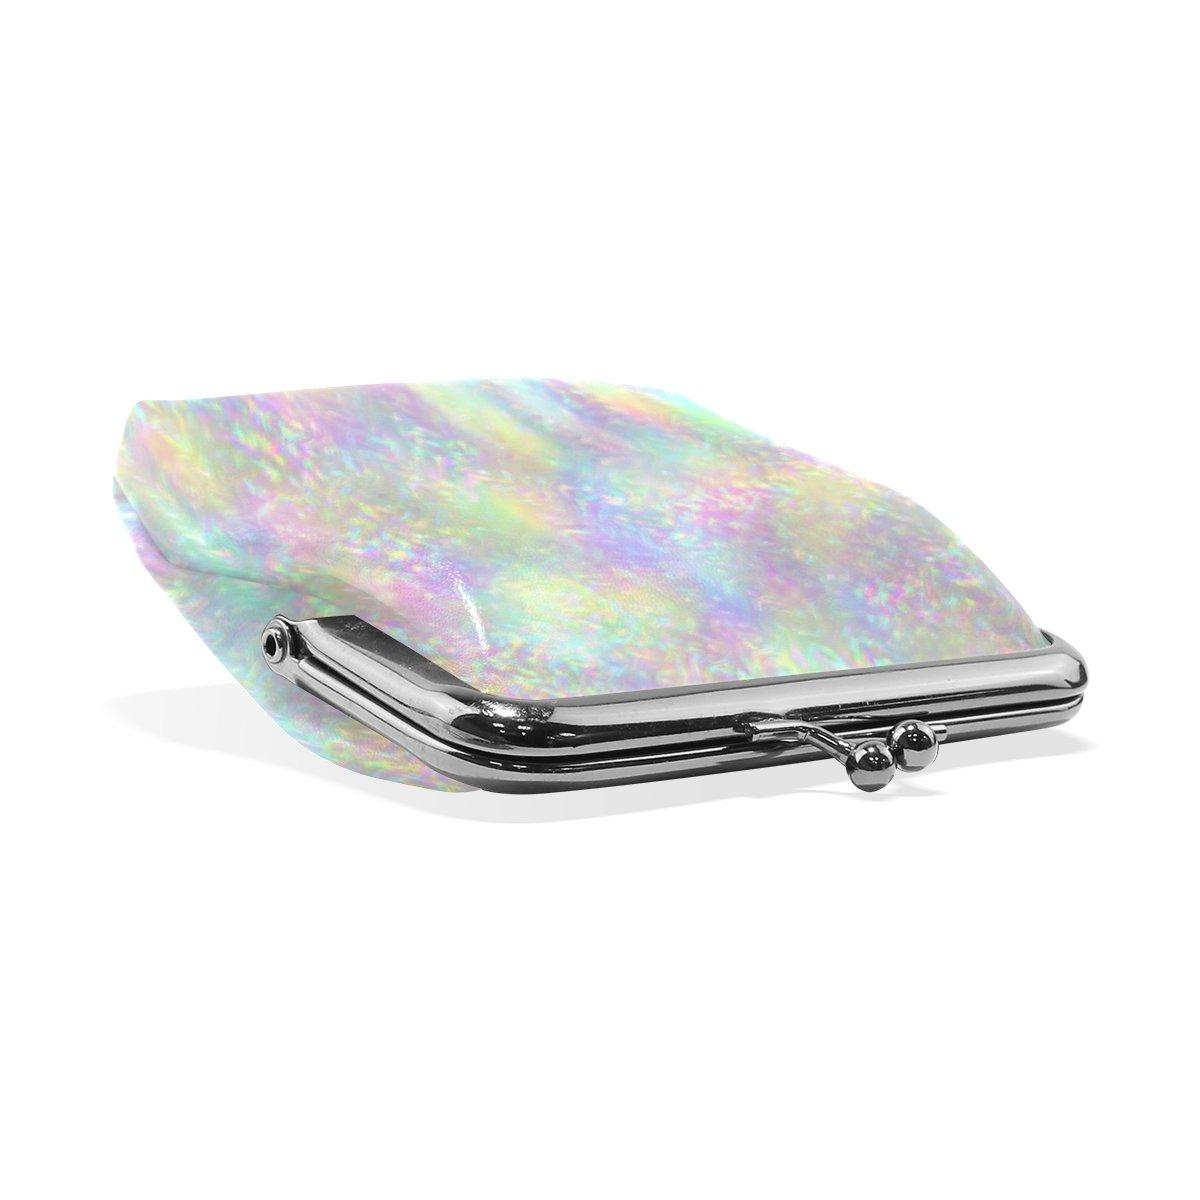 Amazon.com: Carpintero superior holográfico iridiscente ...